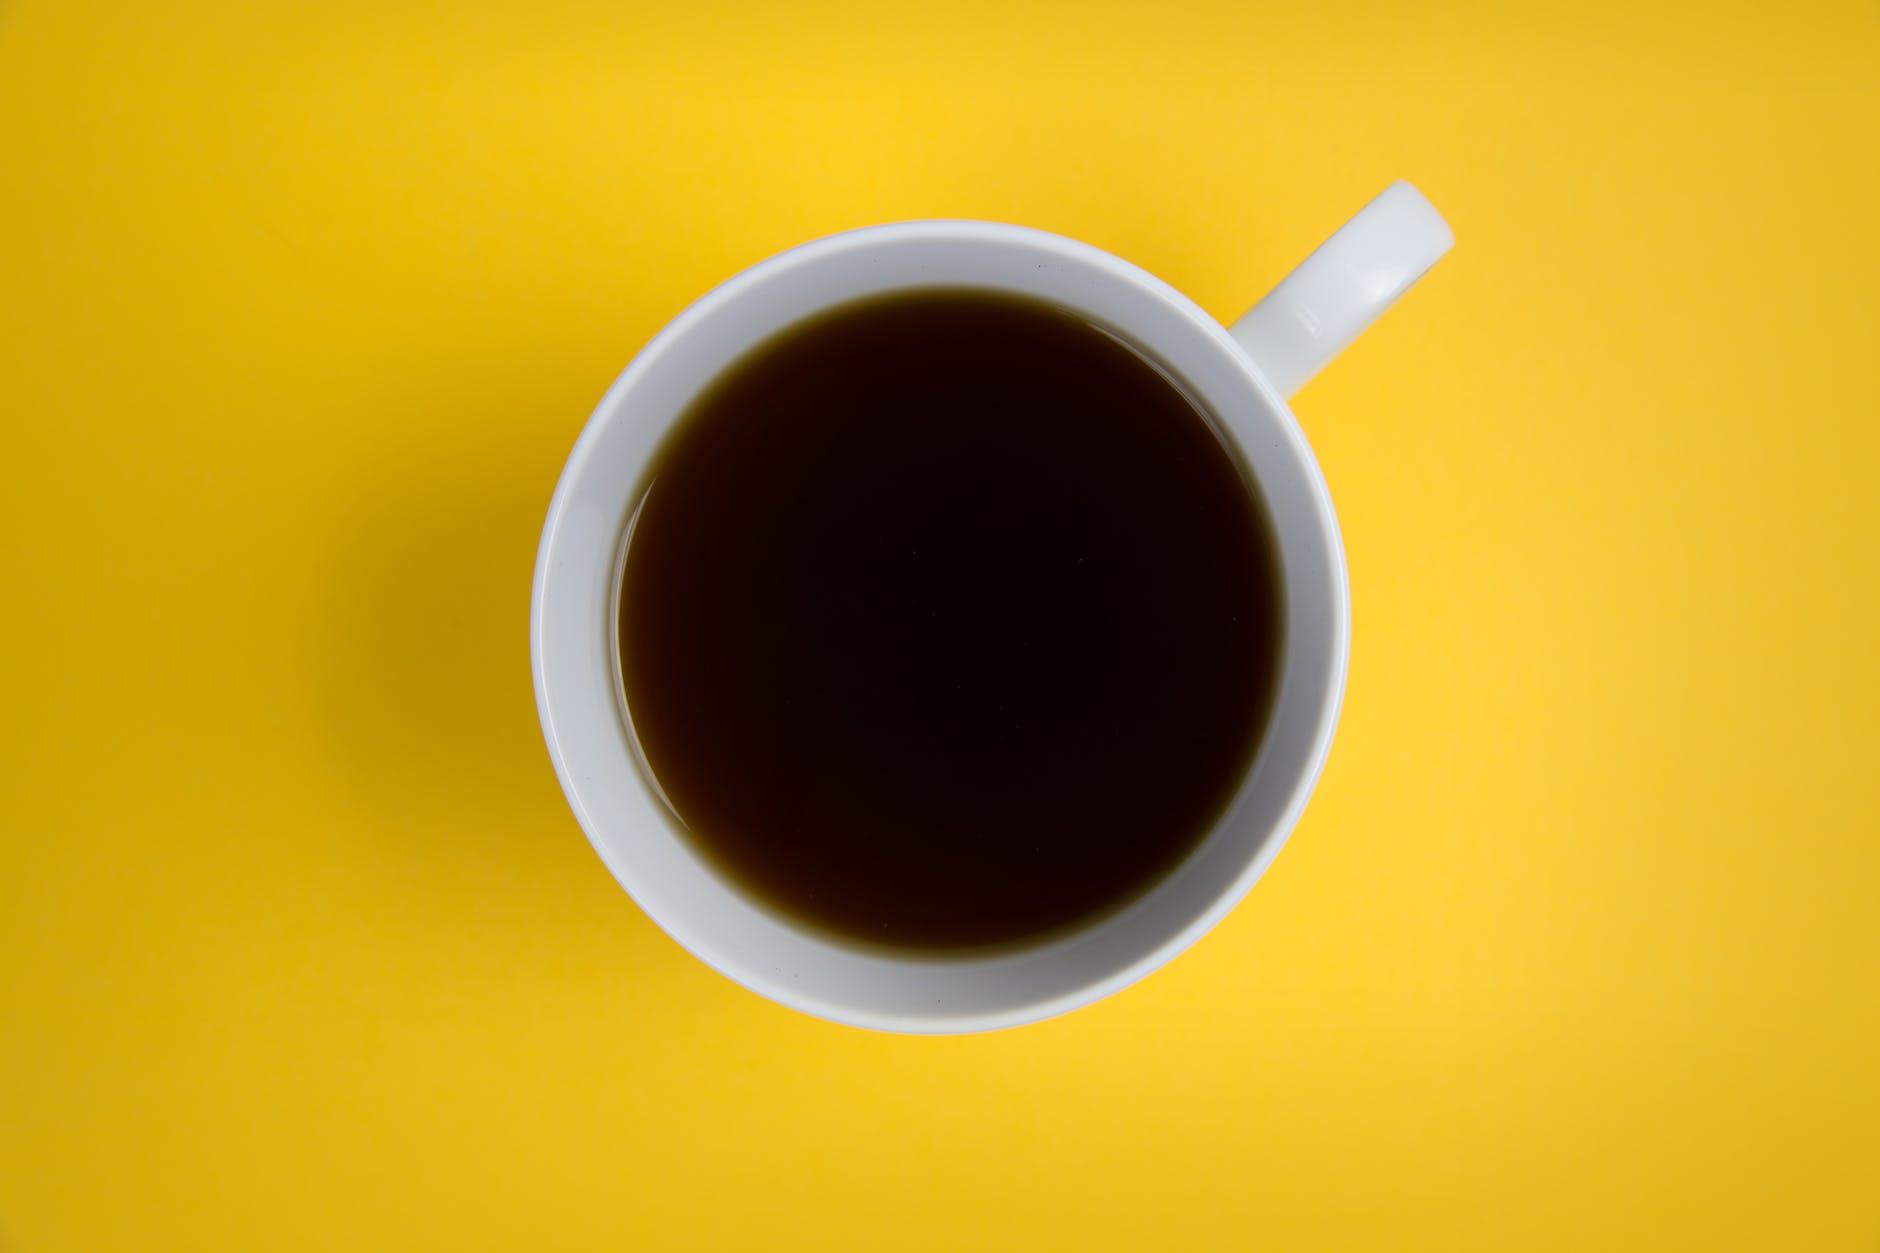 close up photo white ceramic cup